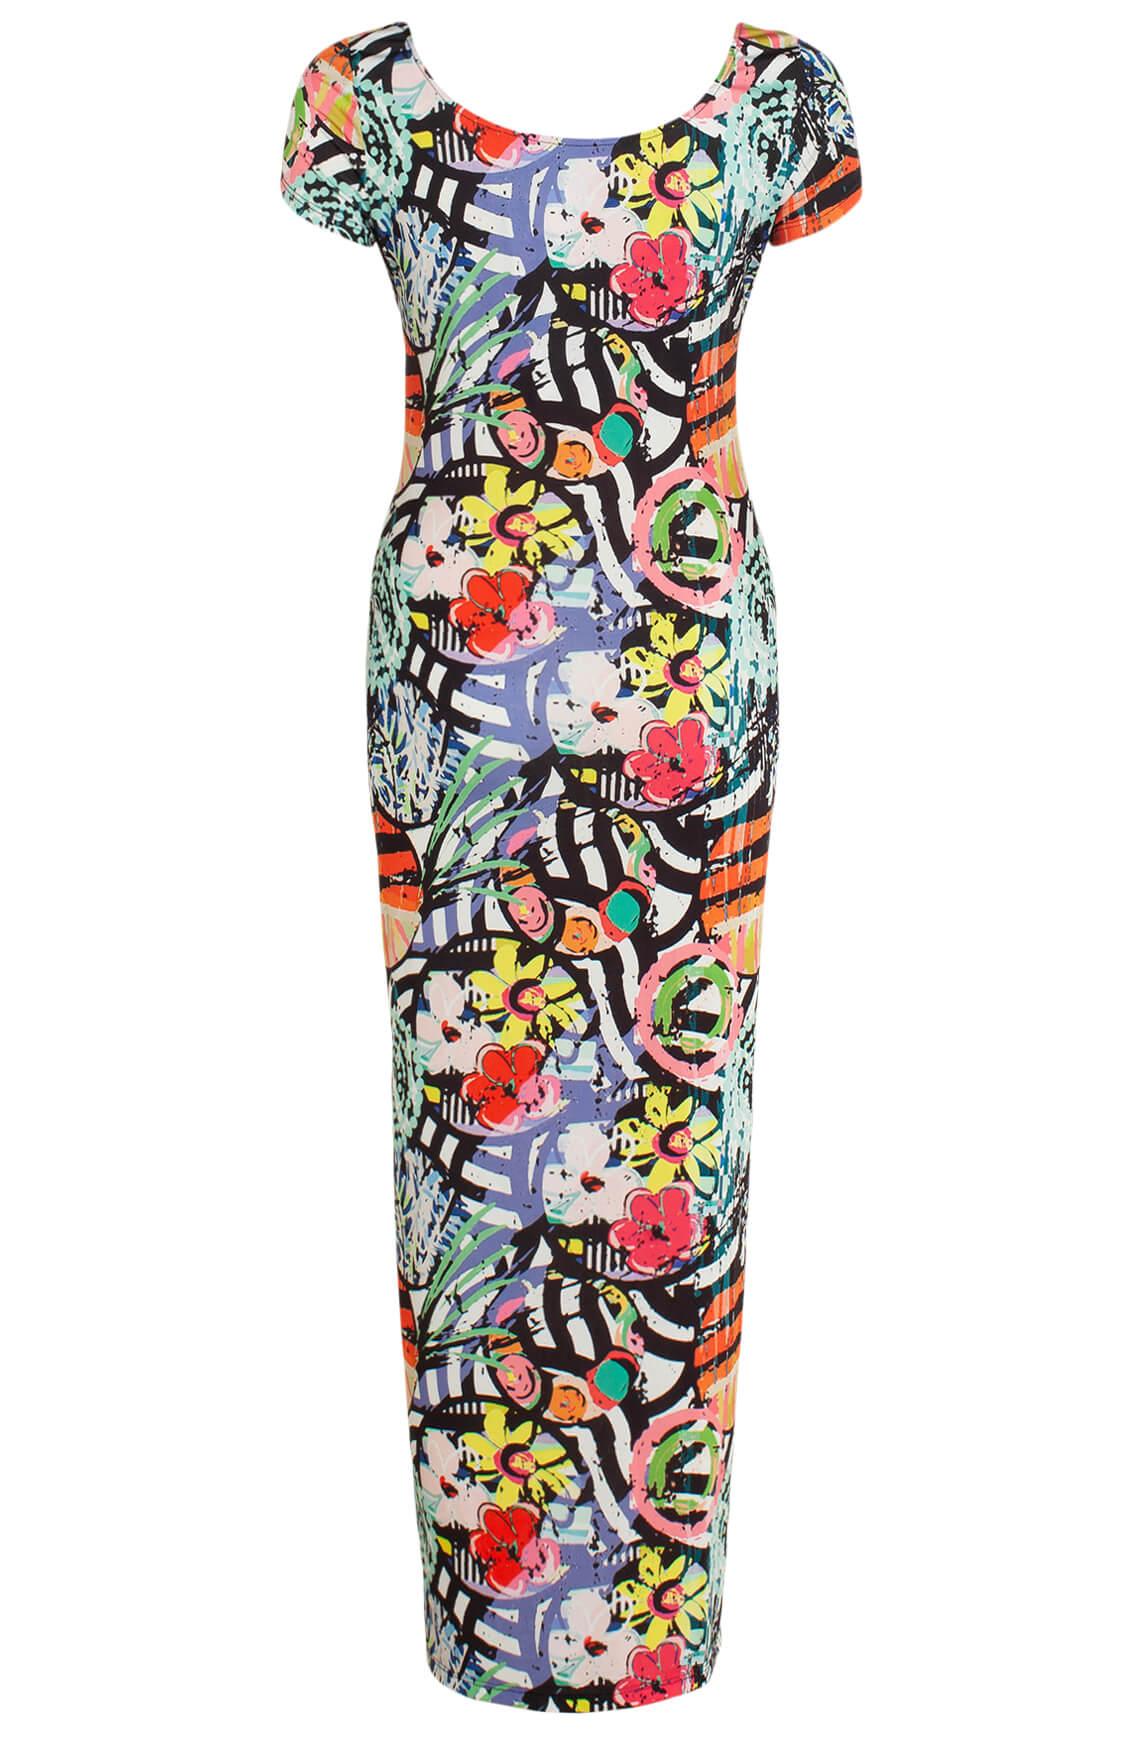 Eroke Dames Lange geprinte jurk MultiColor